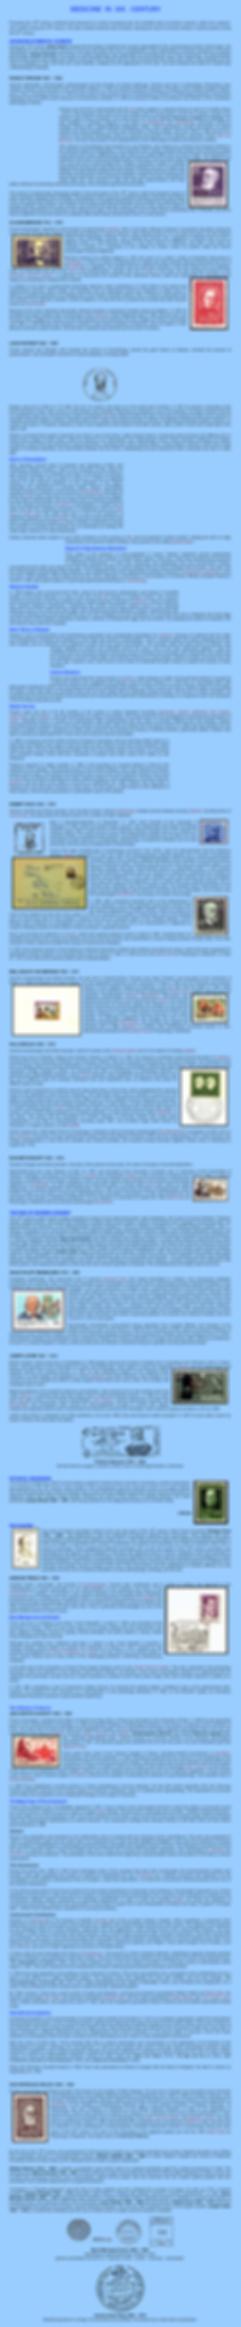 MEDICINE  IN  XIX.  CENTURY.png, Medicine-on-stamps, medicine, postage, postal, collecting, art, history, Medical Philately, Filatelia Médica, Filateli medis, Медицинская Филателия, Filatelia medica, 医療切手, 集邮医学, 의학적으로, Medisch filatelie, medizinische Philatelie, Dr Amir Monir ,Philatélie médicale, Orvosi Filatélia, 集郵醫學, Tıbbi Filateli, #filatelia ,#philately ,#stamp #stampcollection, #medicalphilately ,#medicine_on_stamps ,#art ,#thematics ,#philatelic #timbre, #philatélie ,#HistoryOfMedicine, #medicine #History, #postalstamps ,#artsinhealth ,Medikal na Philately, Falsafah Perubatan, Ιατρική Φιλοτελία, پزشکی فیلاته, طوابع طبية